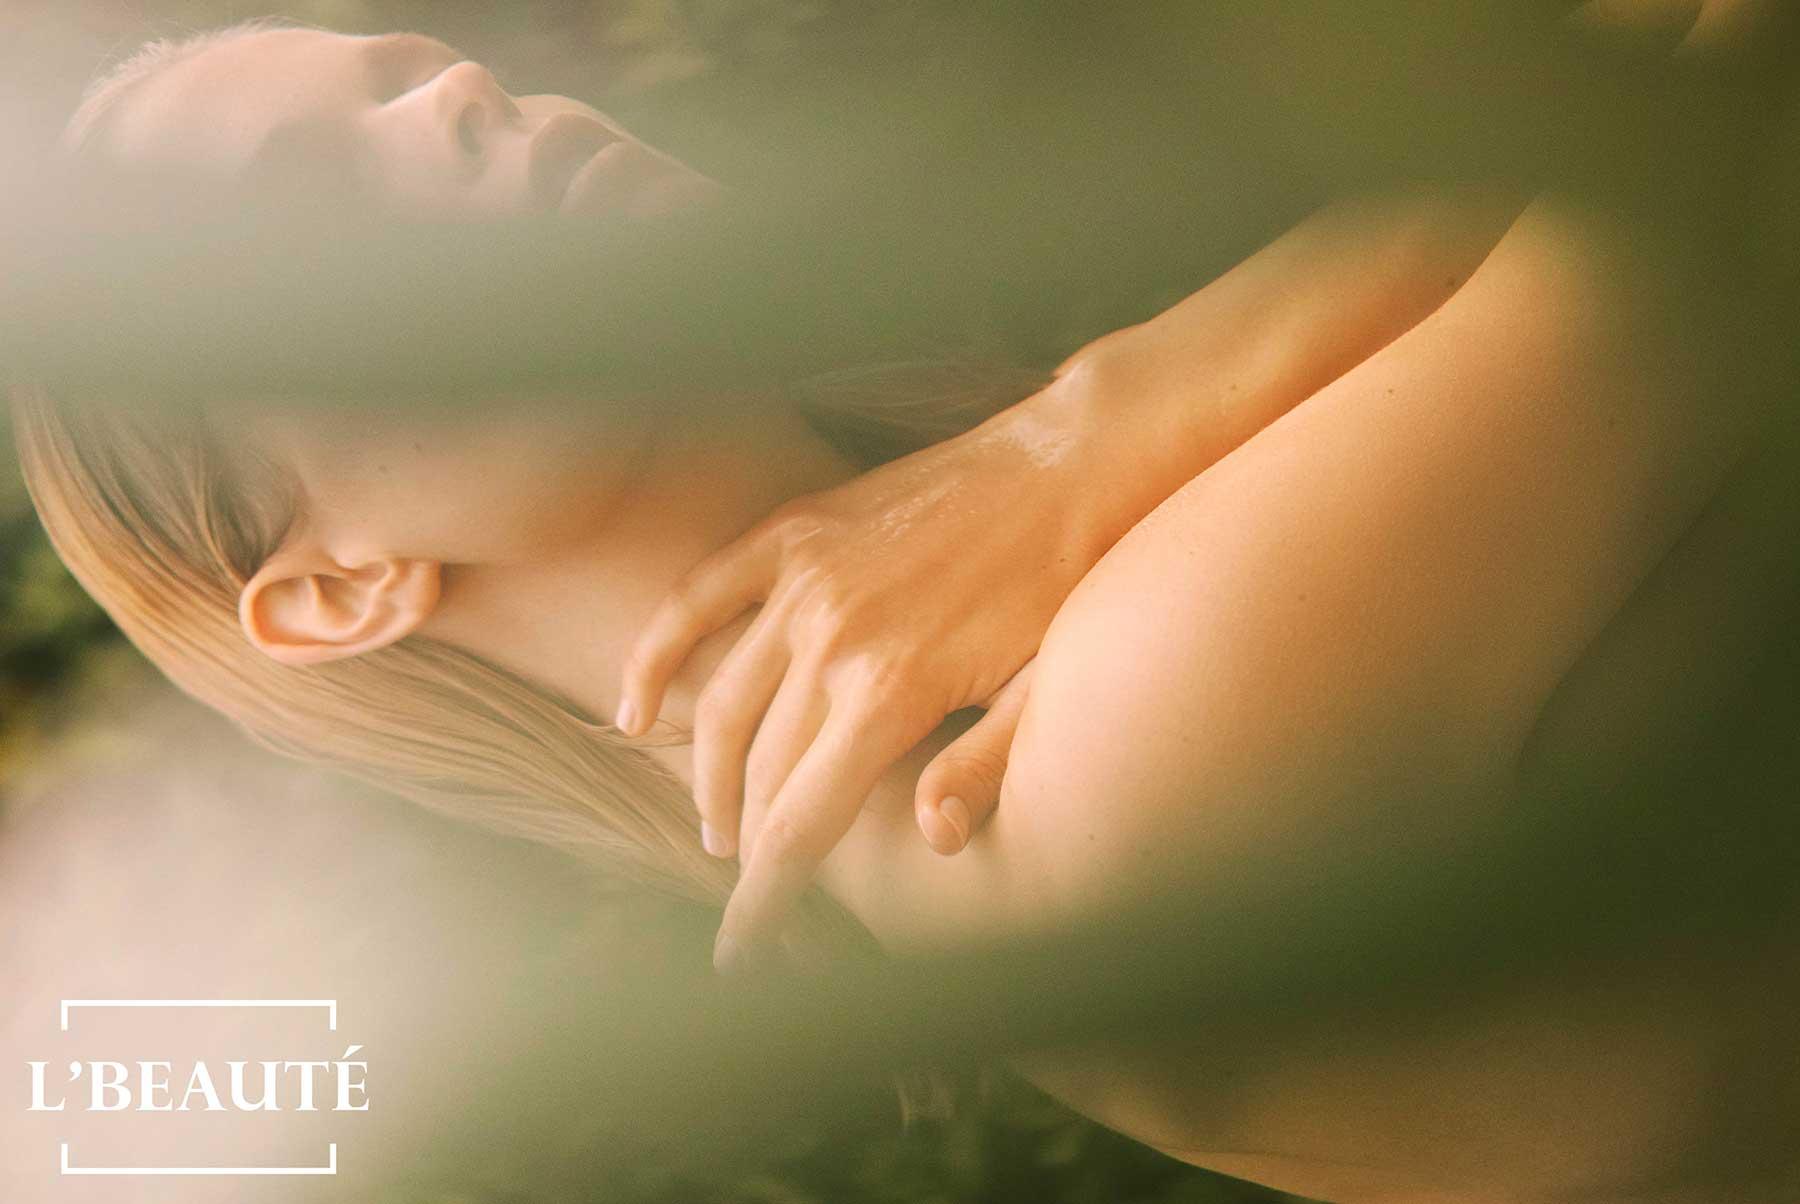 LBeaute-Wellness-Beauty-Cover-Febrero-202110